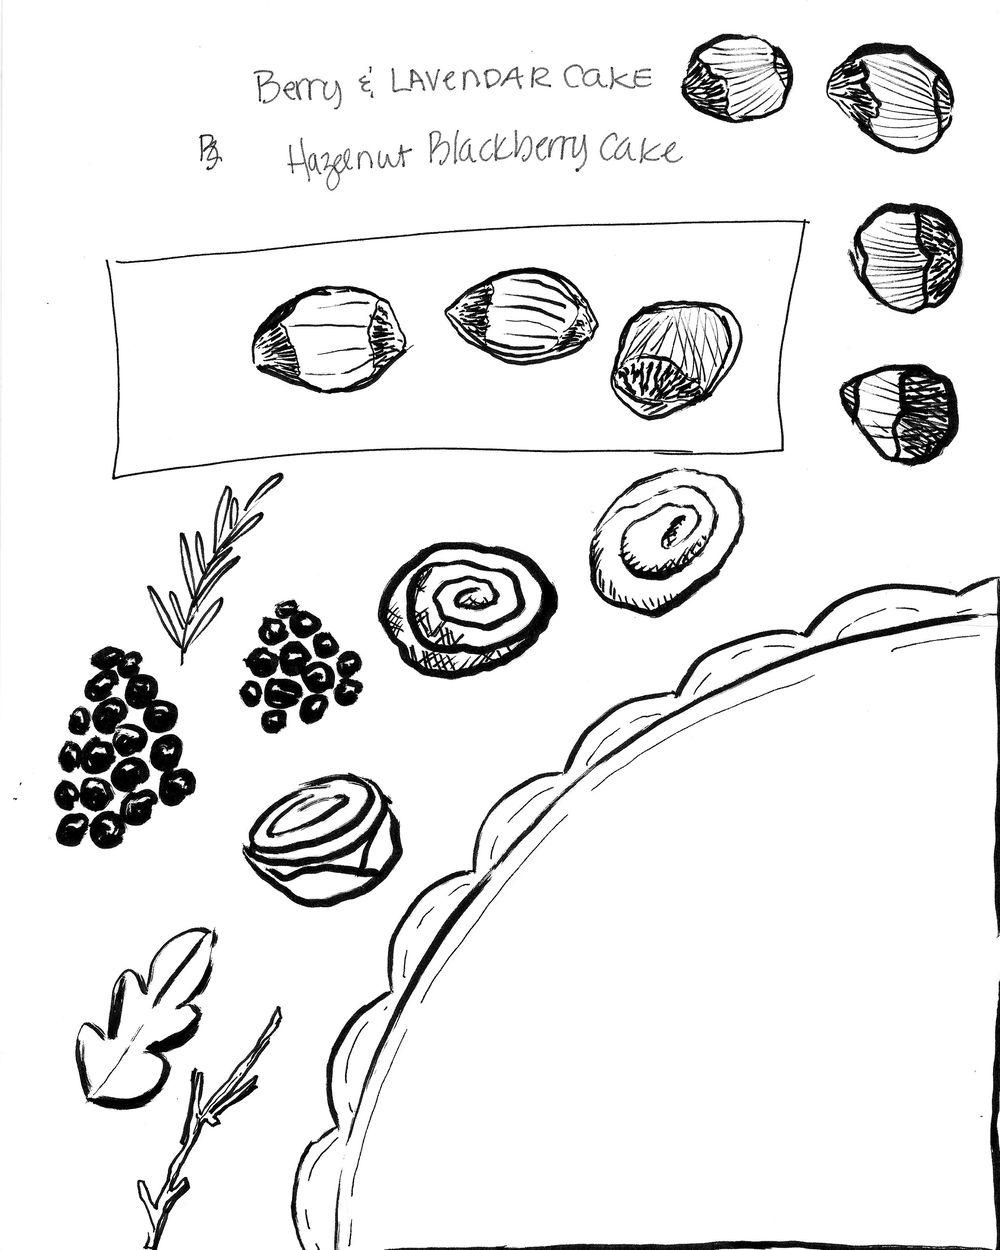 HAZELNUT AND BLACKBERRY CAKE - image 3 - student project